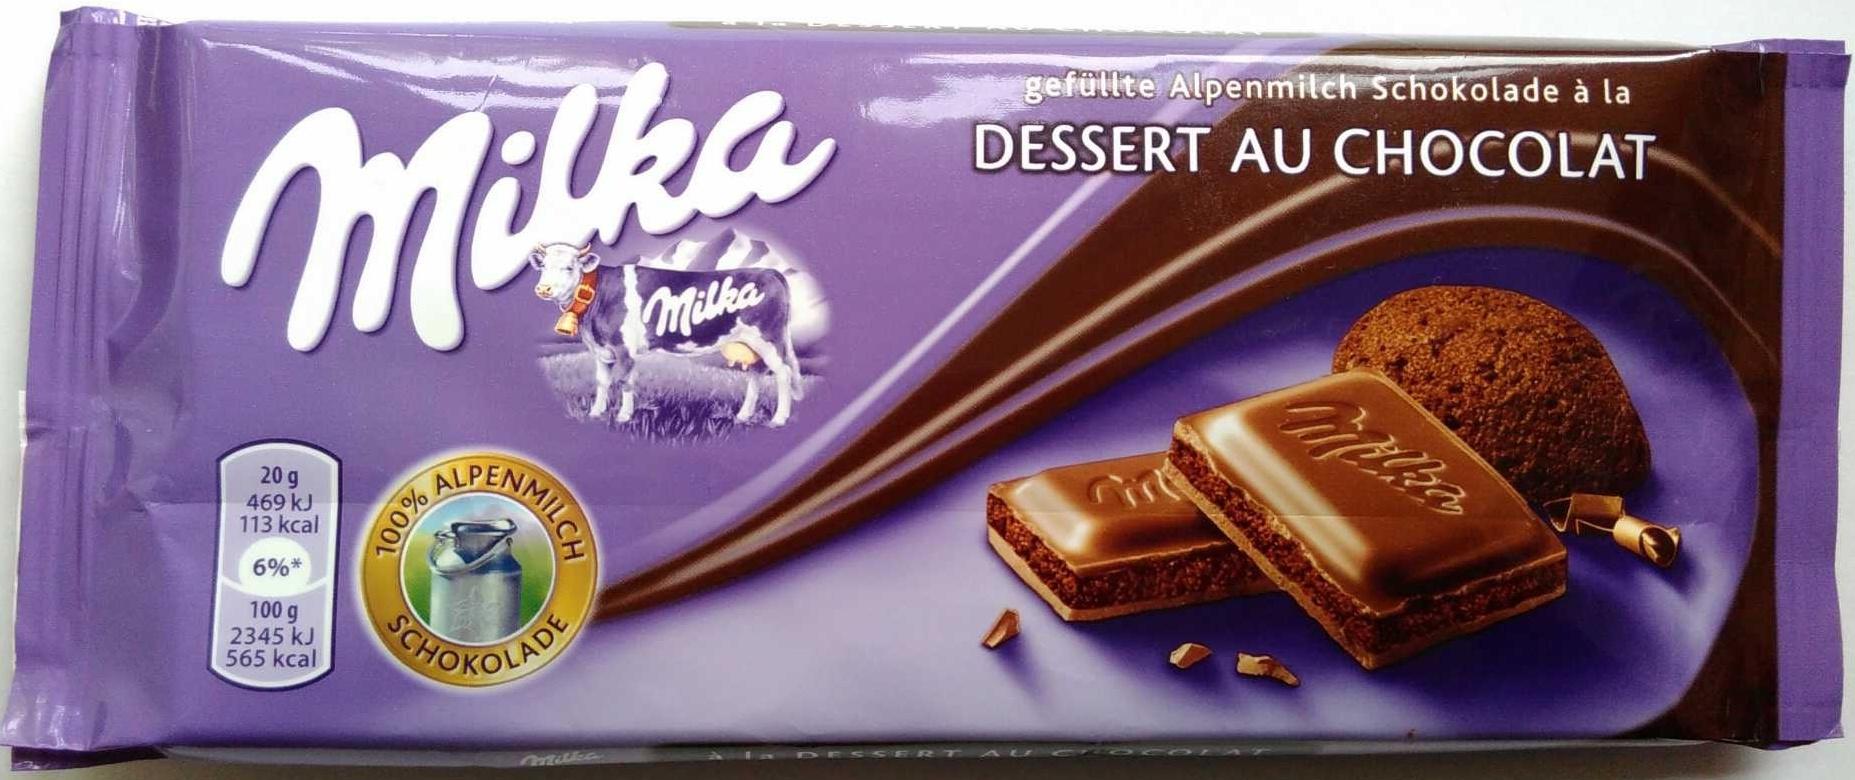 Dessert au Chocolat - نتاج - de